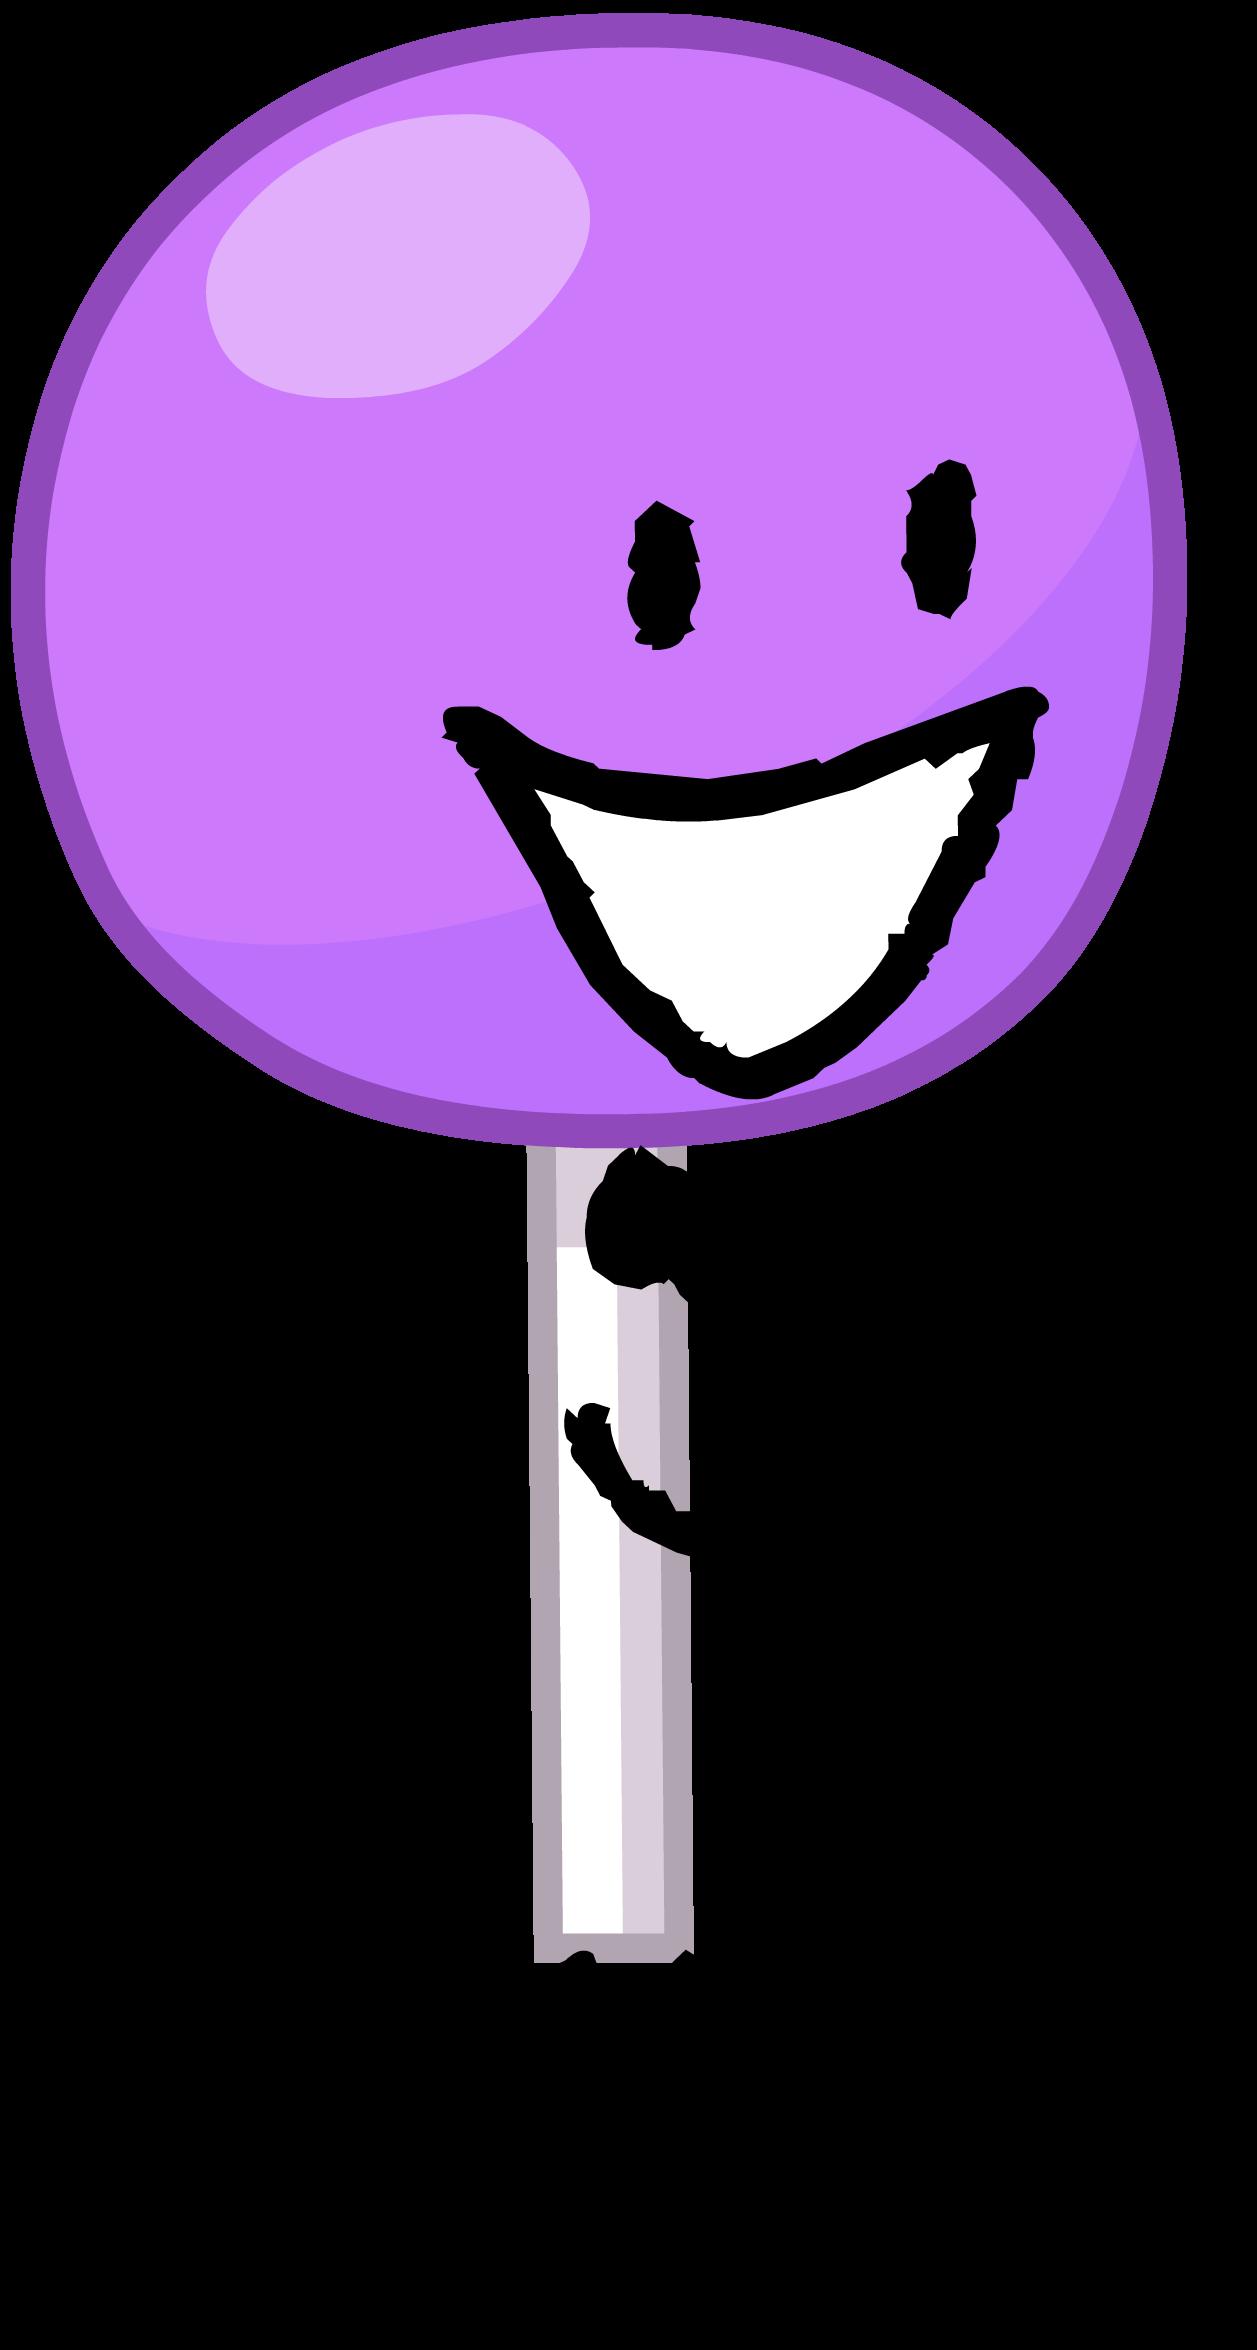 David Lee Basketball Wiki >> Lollipop | Battle for Dream Island Wiki | FANDOM powered by Wikia